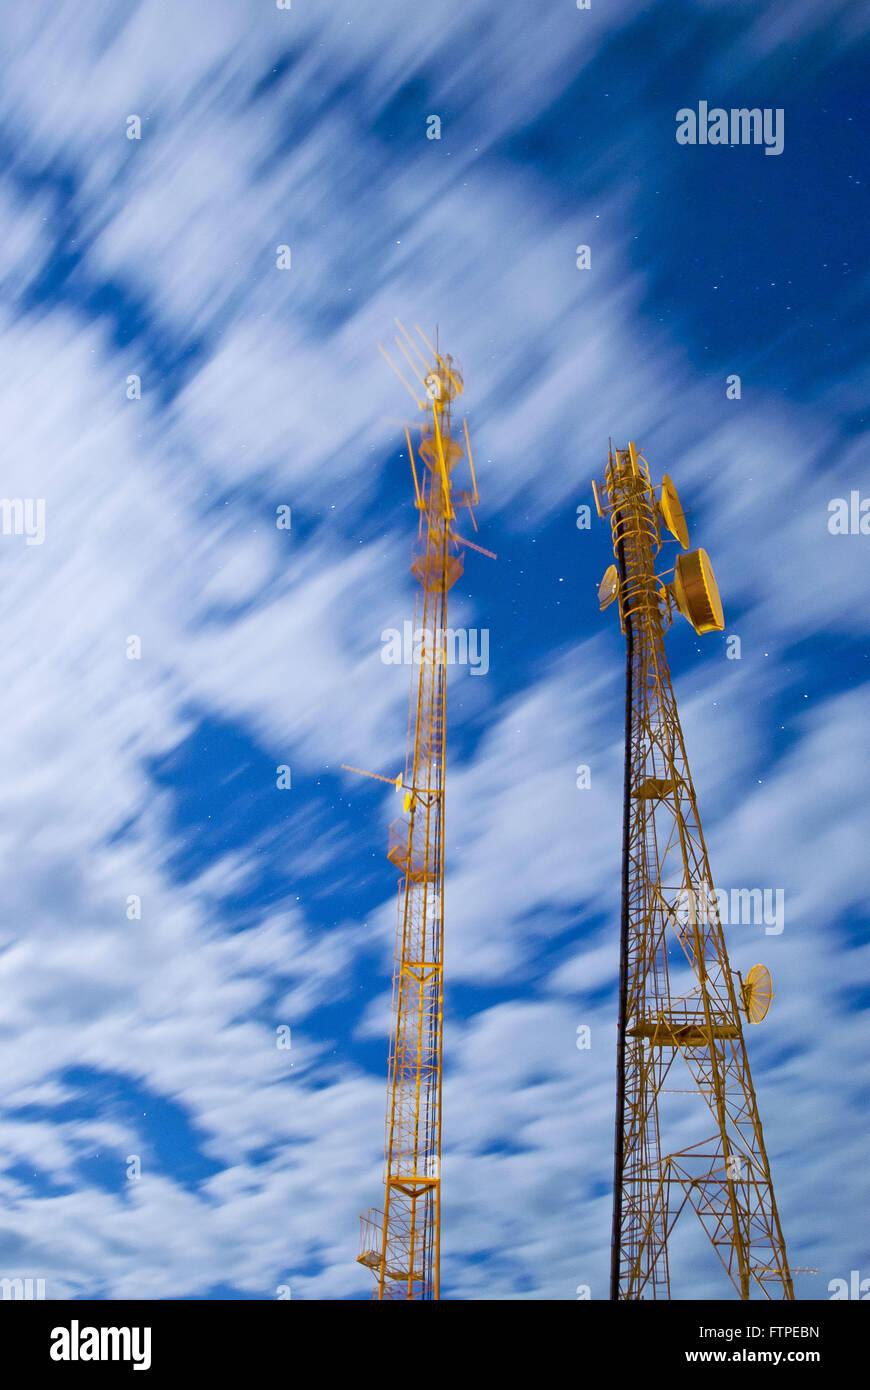 Telekommunikation-Antennen Stadt Strohhalme Stockbild